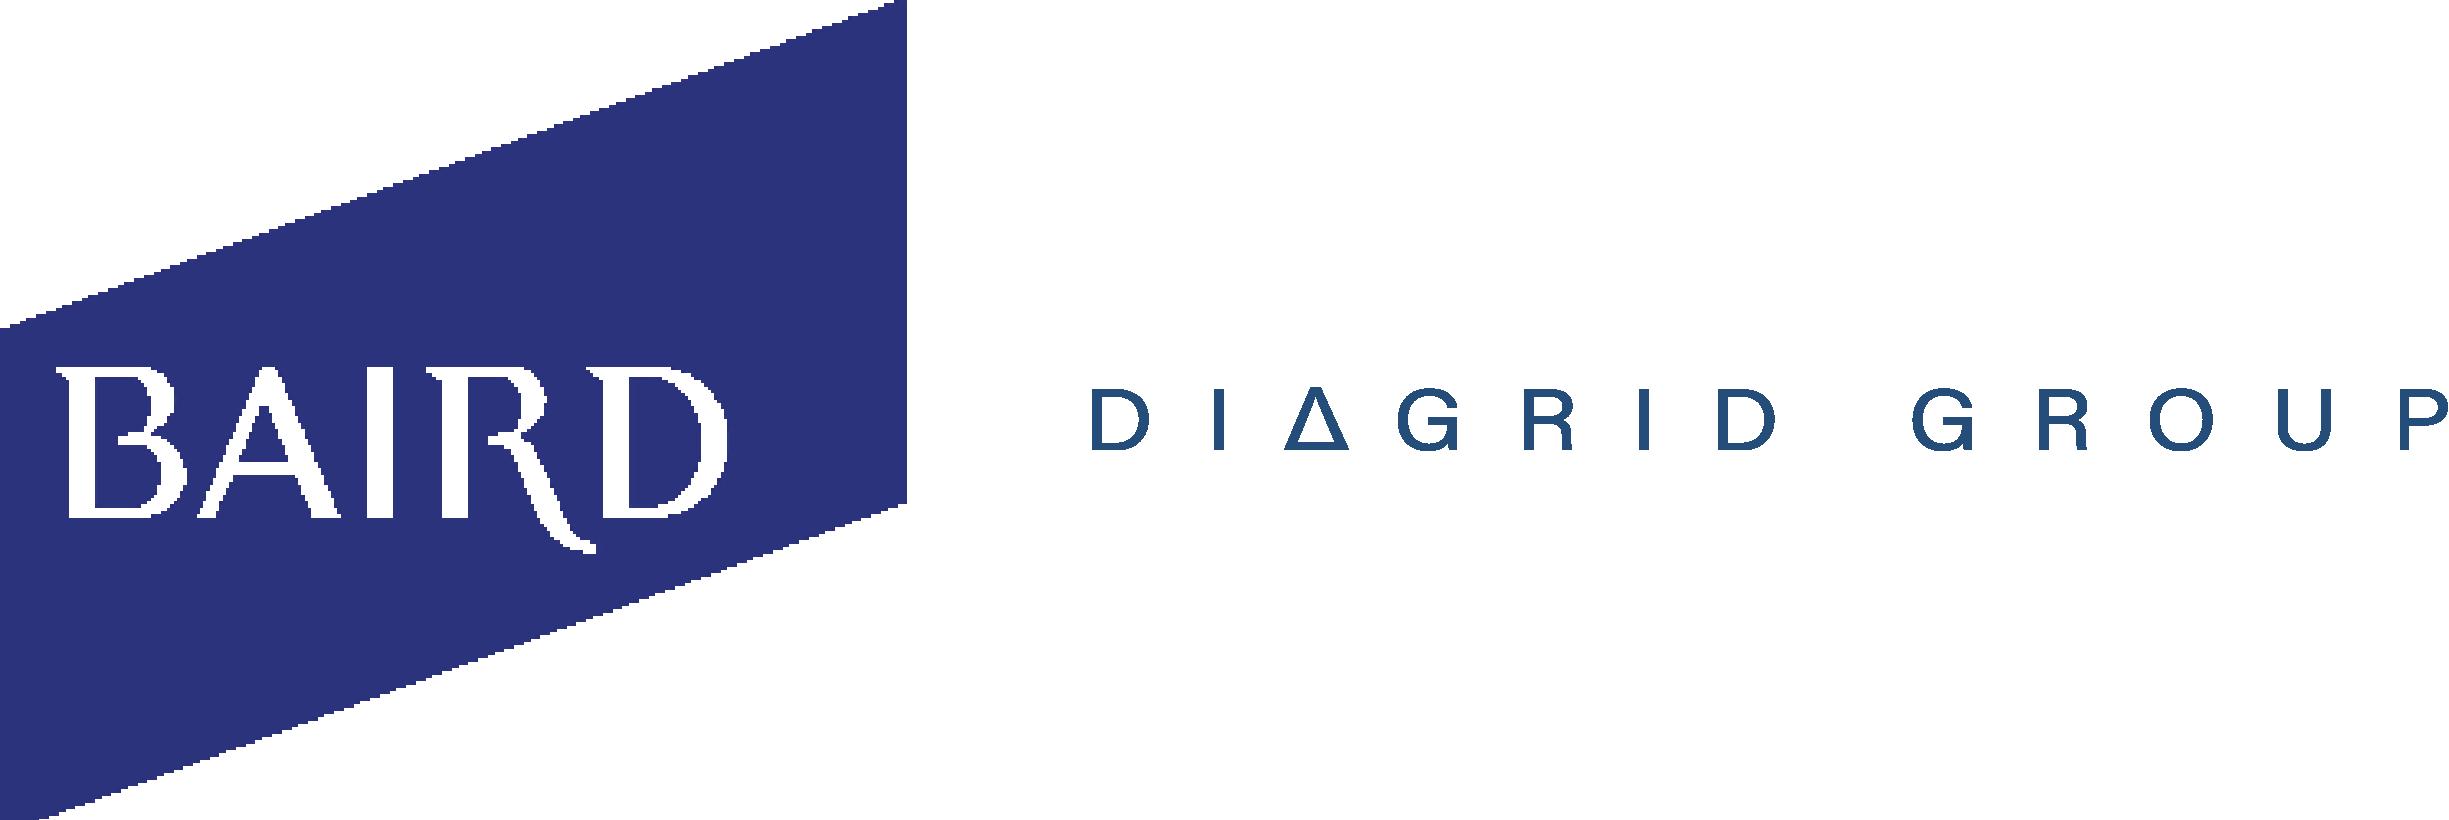 Baird Diagrid Group